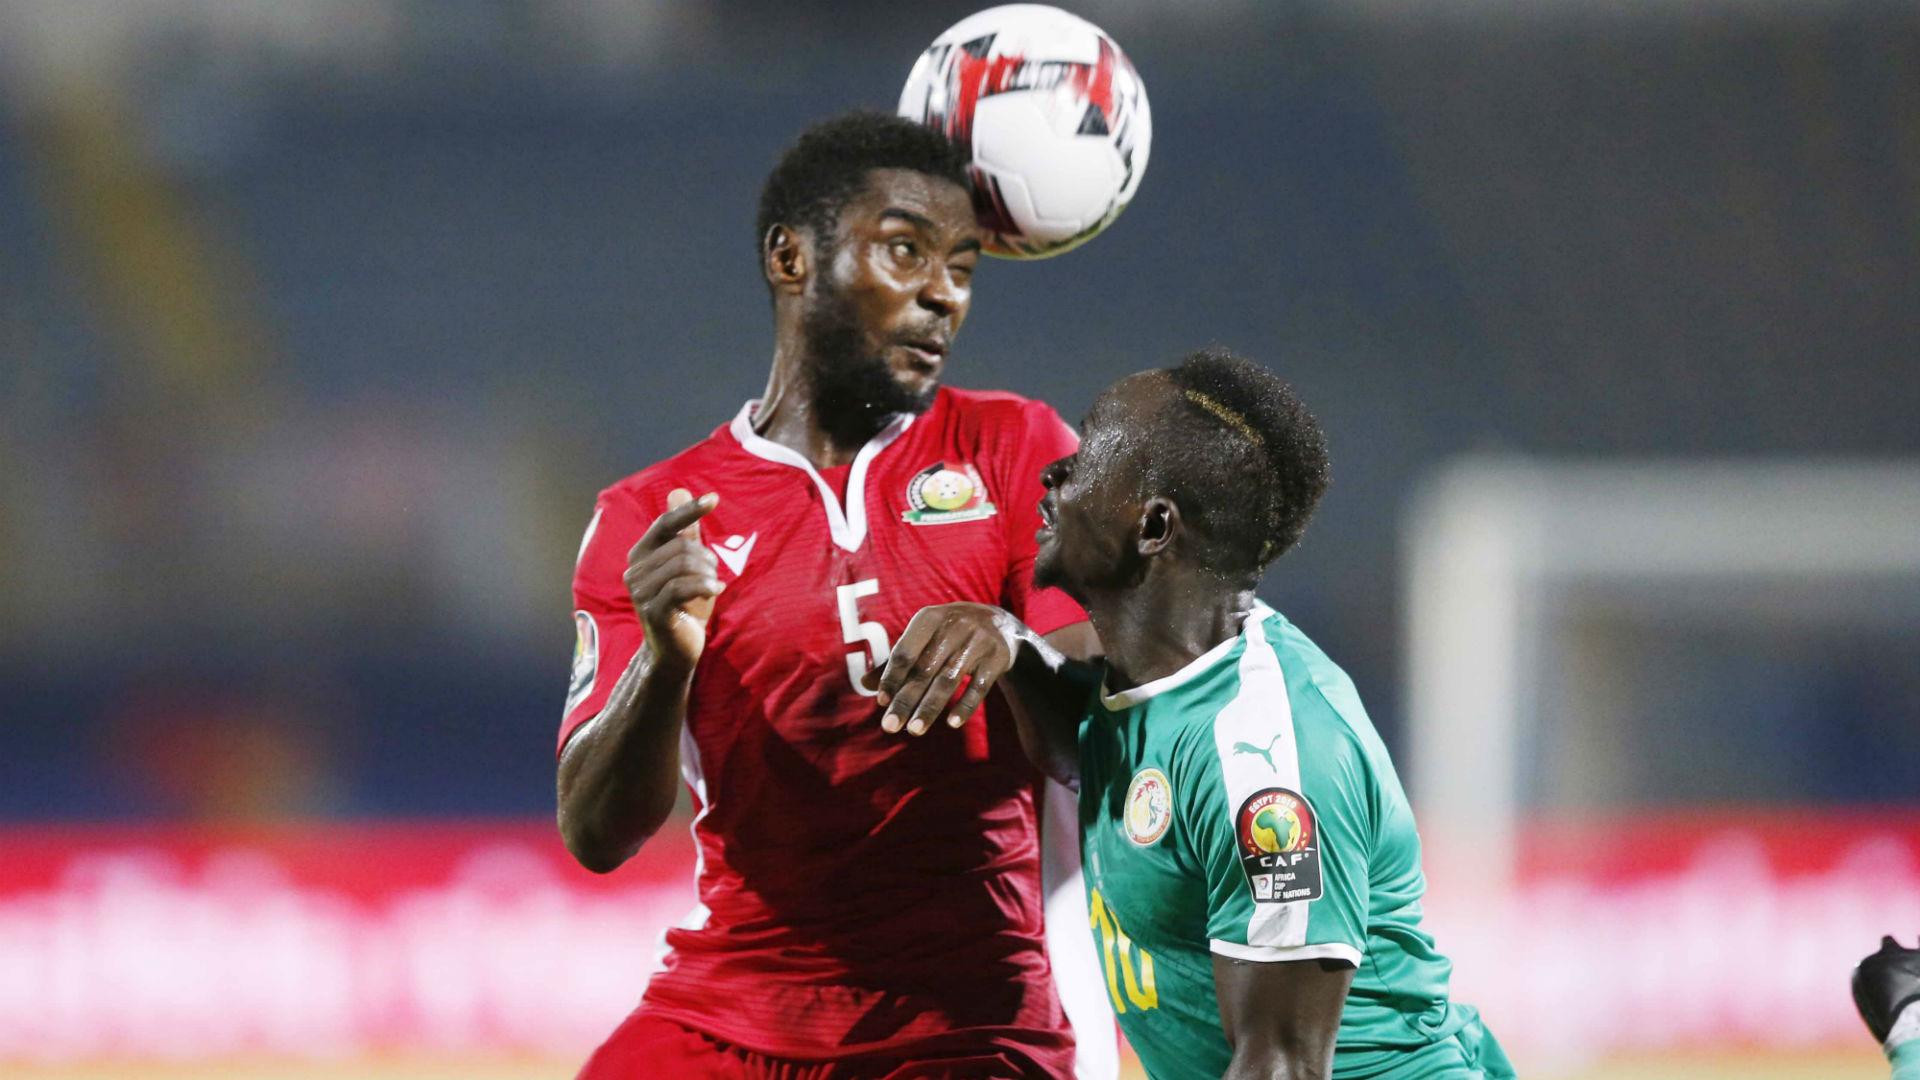 Musa: Kenya defender's move to Sofapaka FC falls through